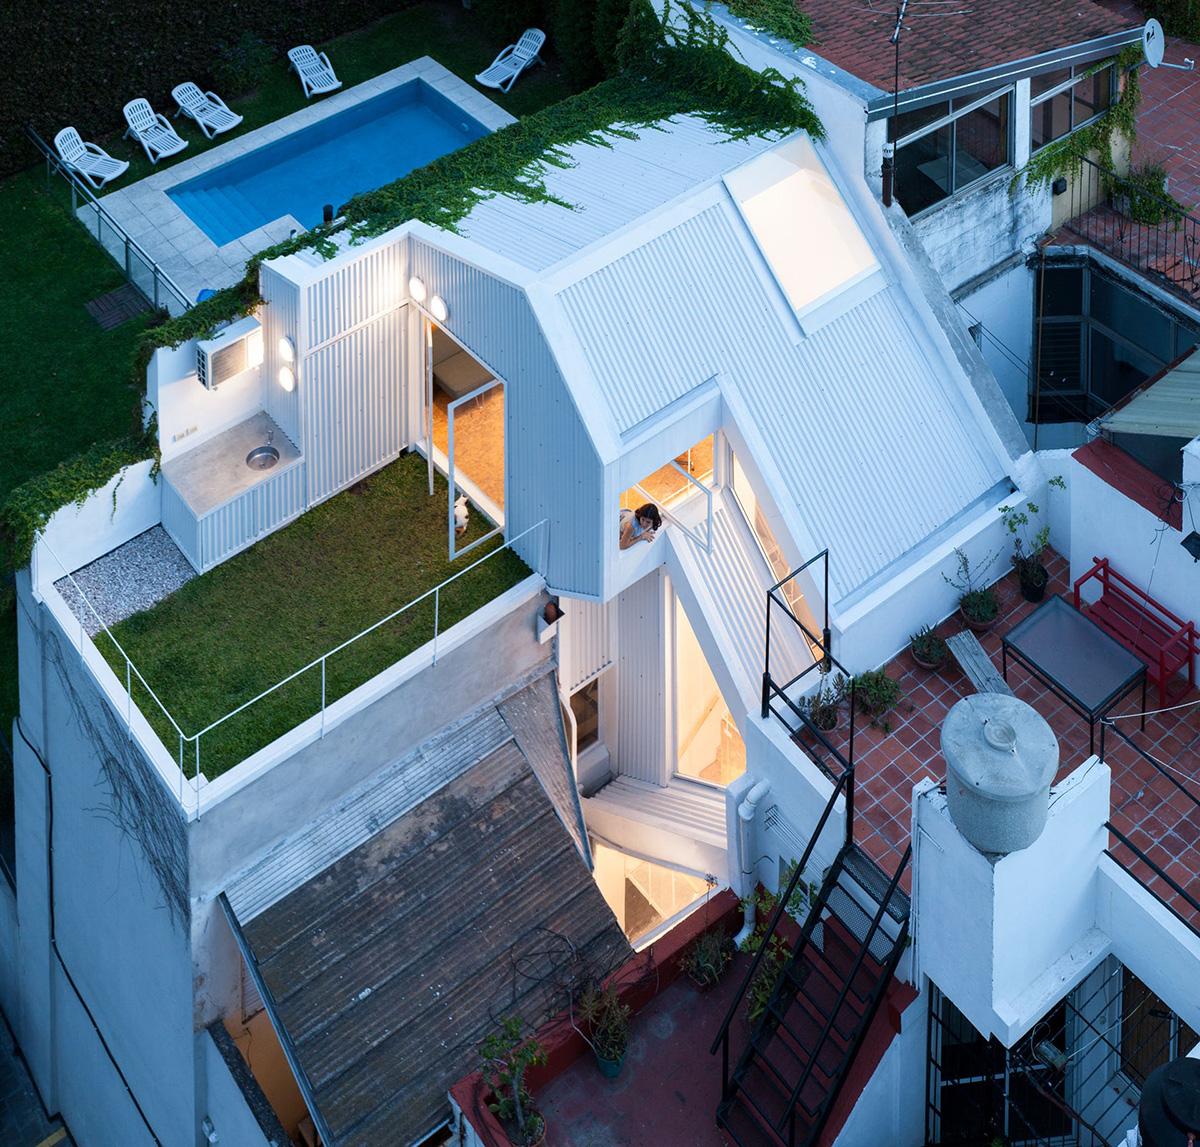 01-ph-lavalleja-ccpm-arquitectos-foto-javier-agustin-rojas